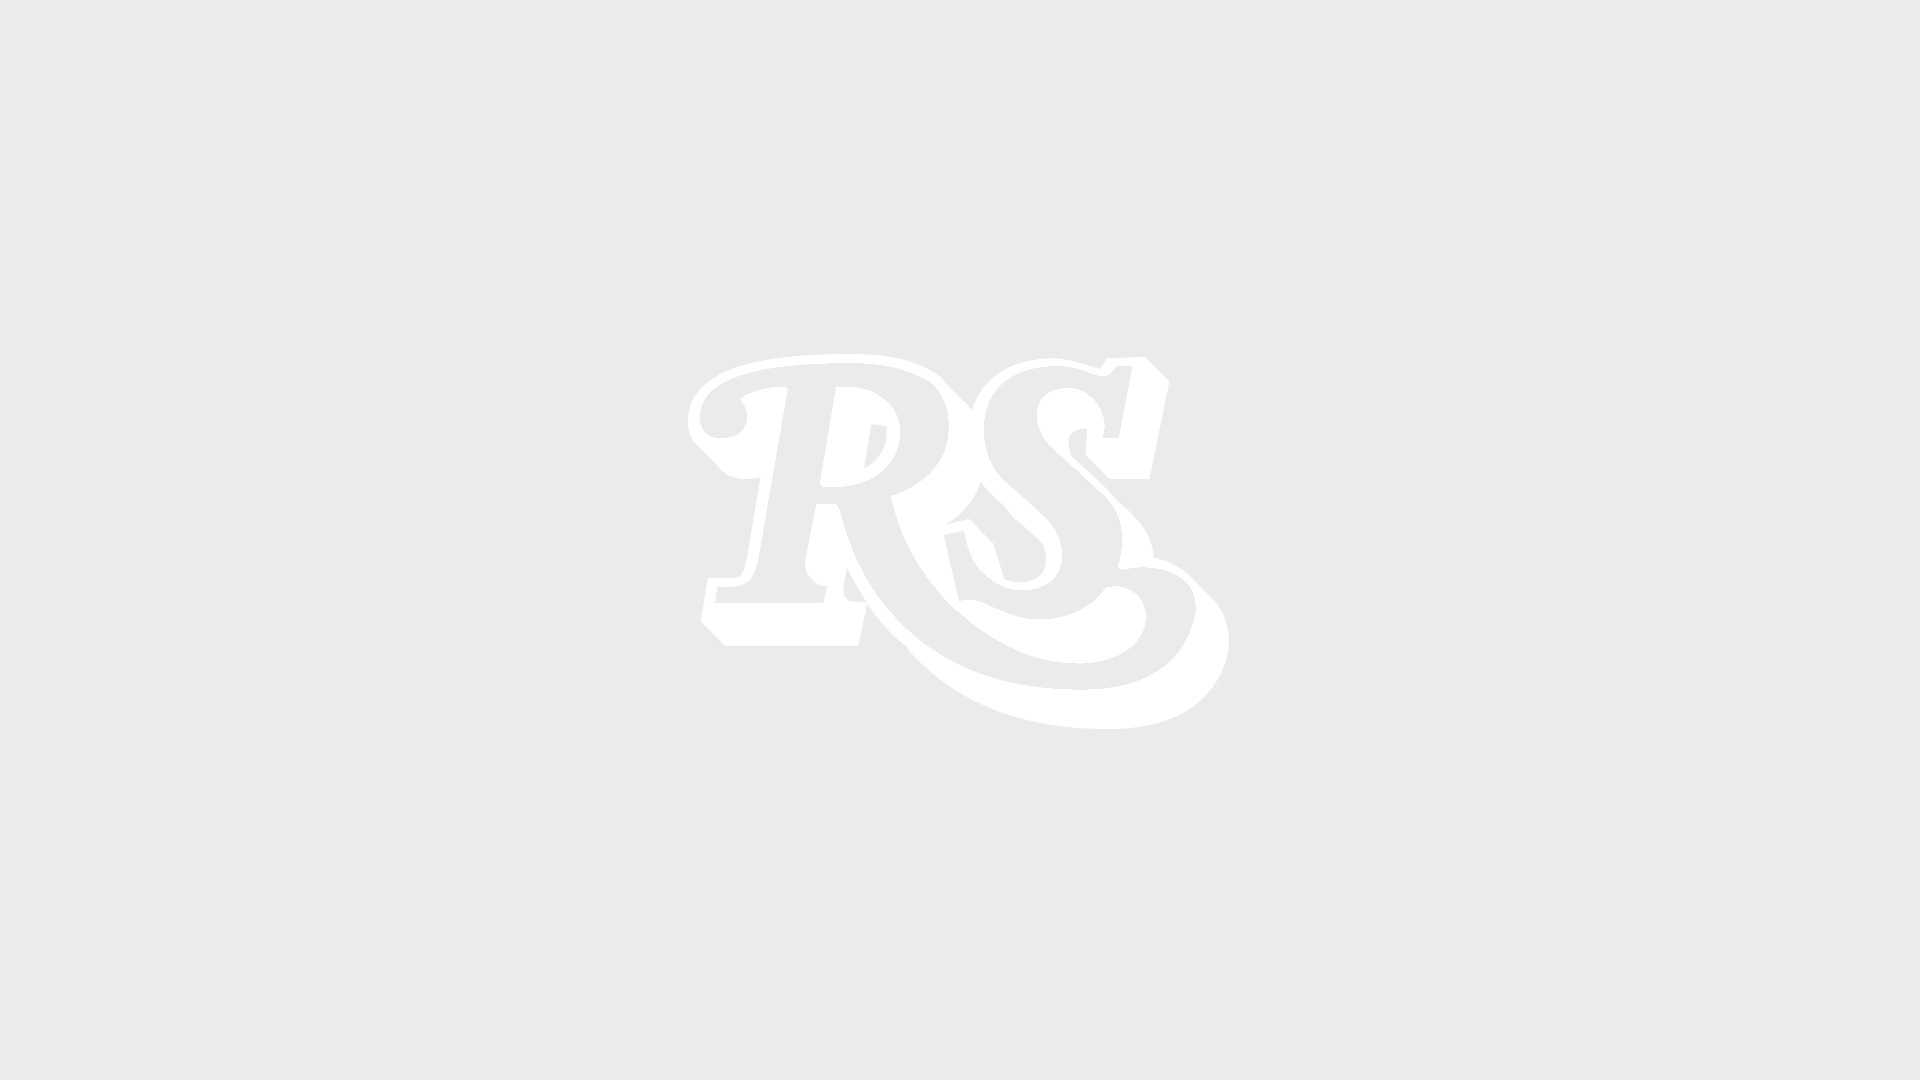 James Morrison (08. 04. – 09.06.)